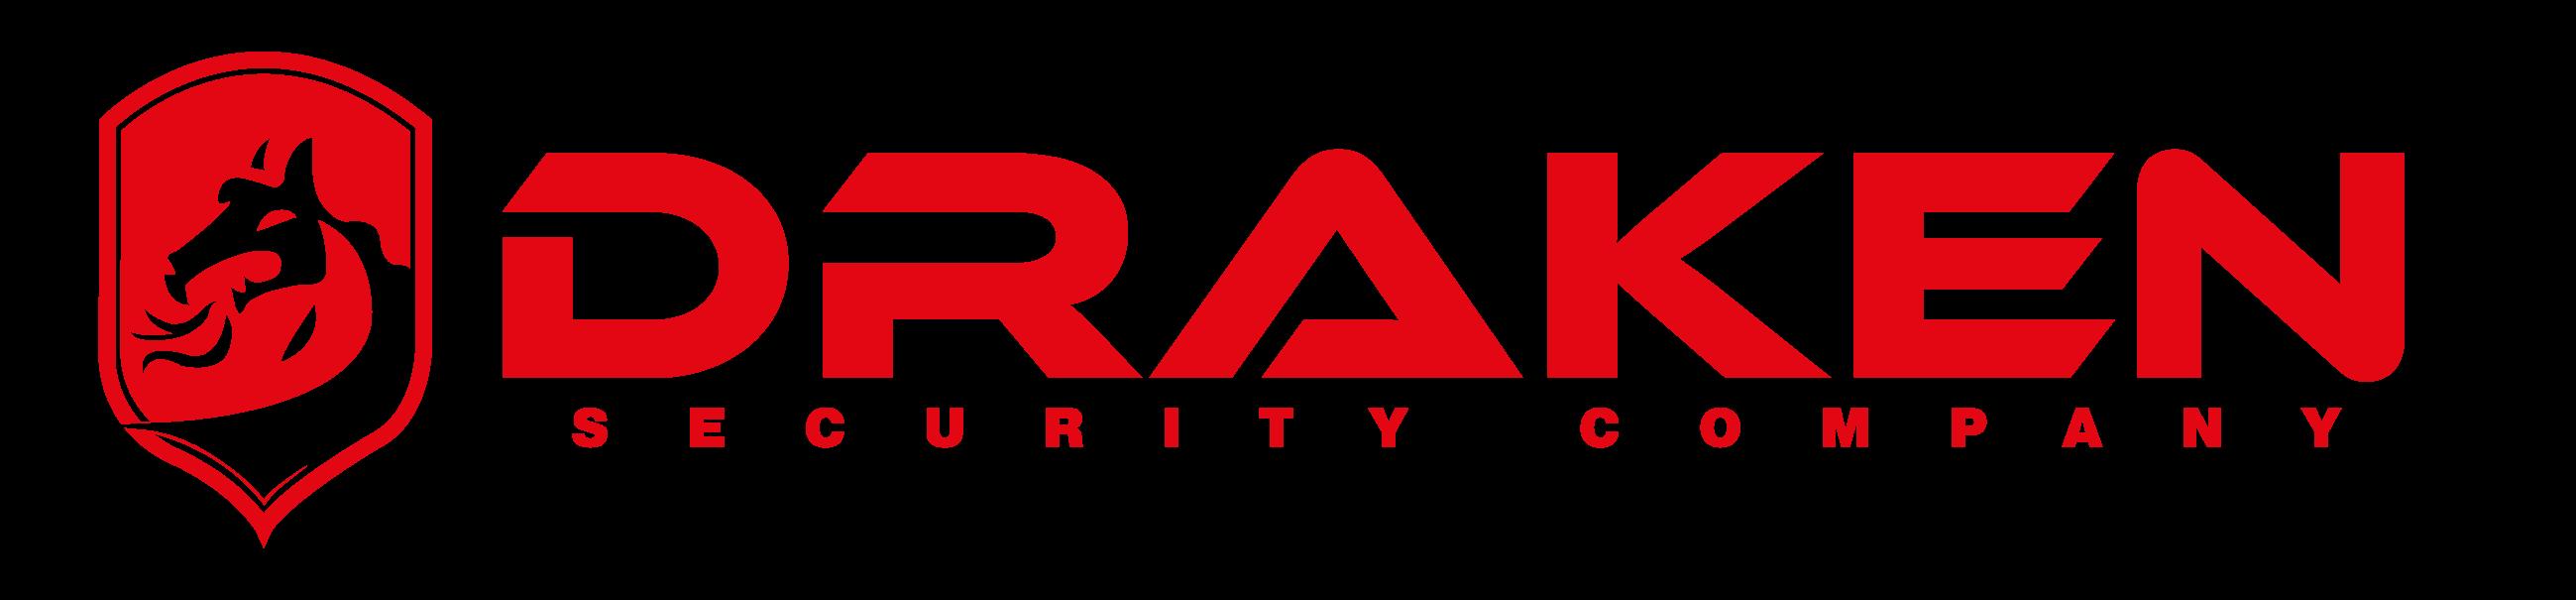 Official DRAKEN Security